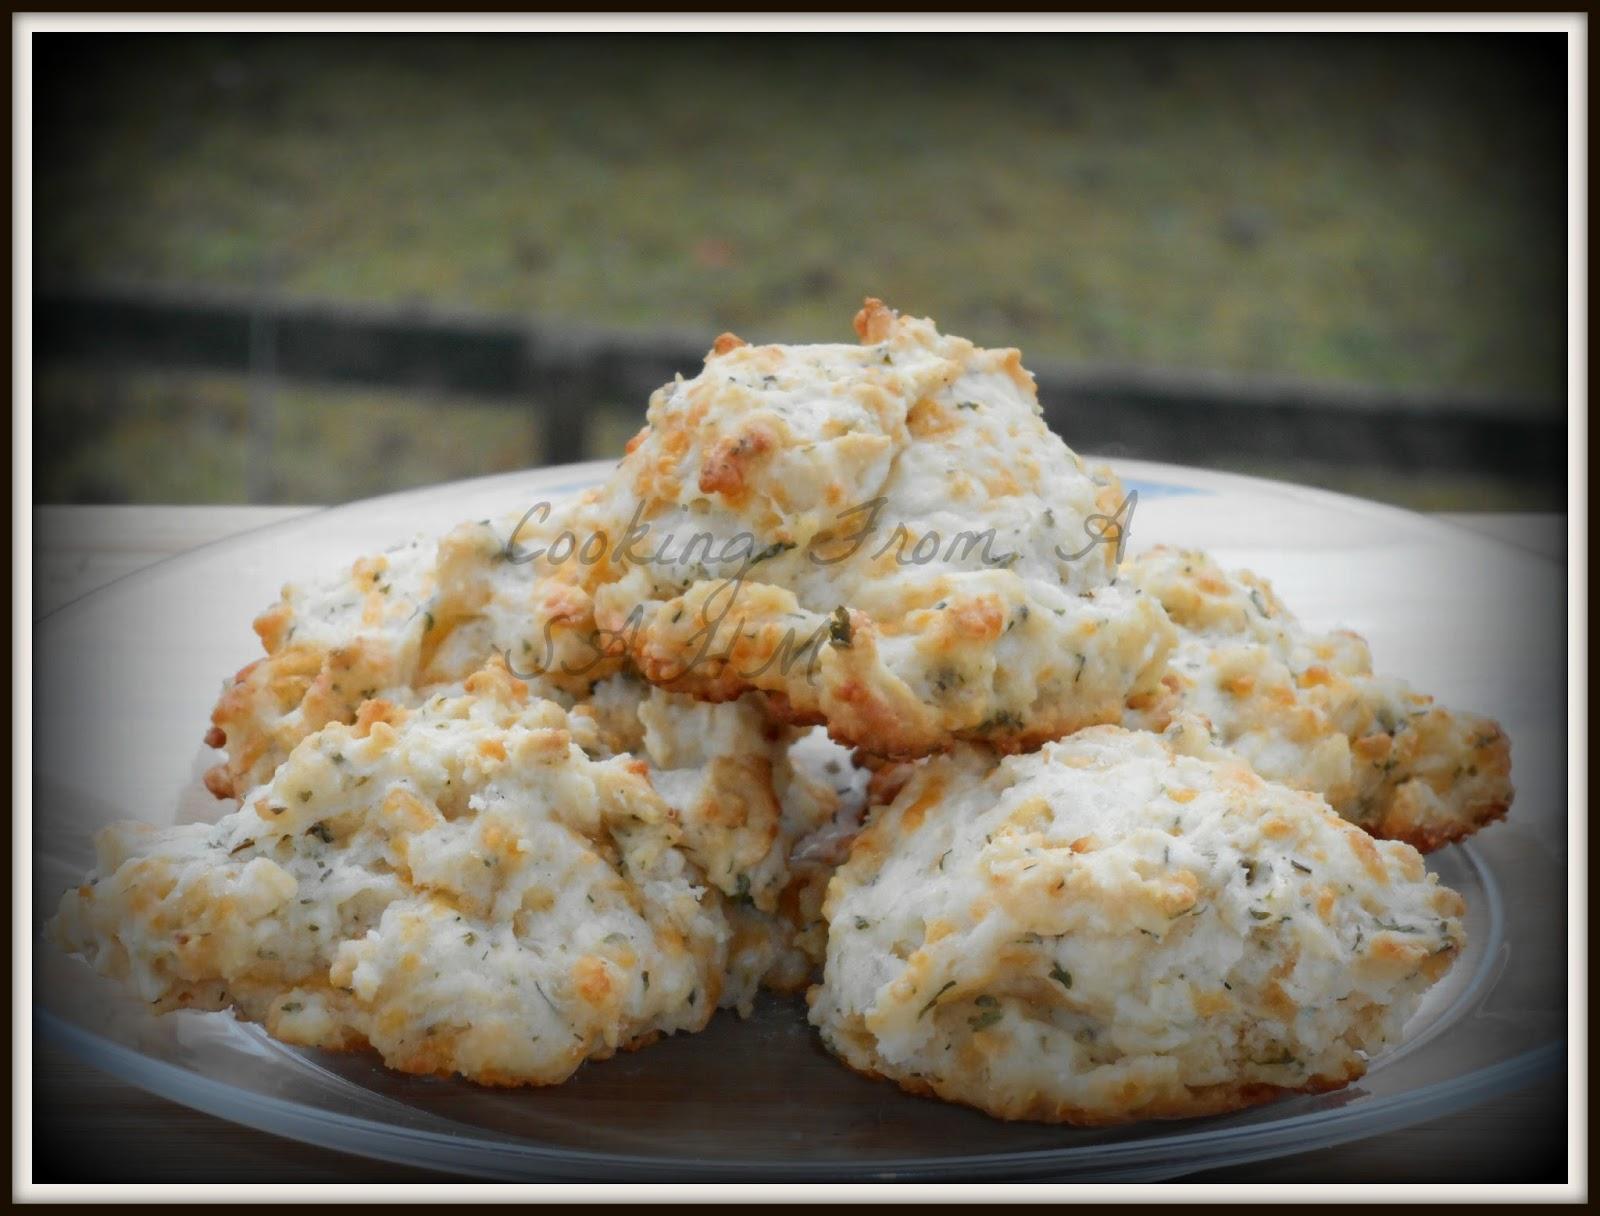 Cheddar Sour Cream Drop Biscuits